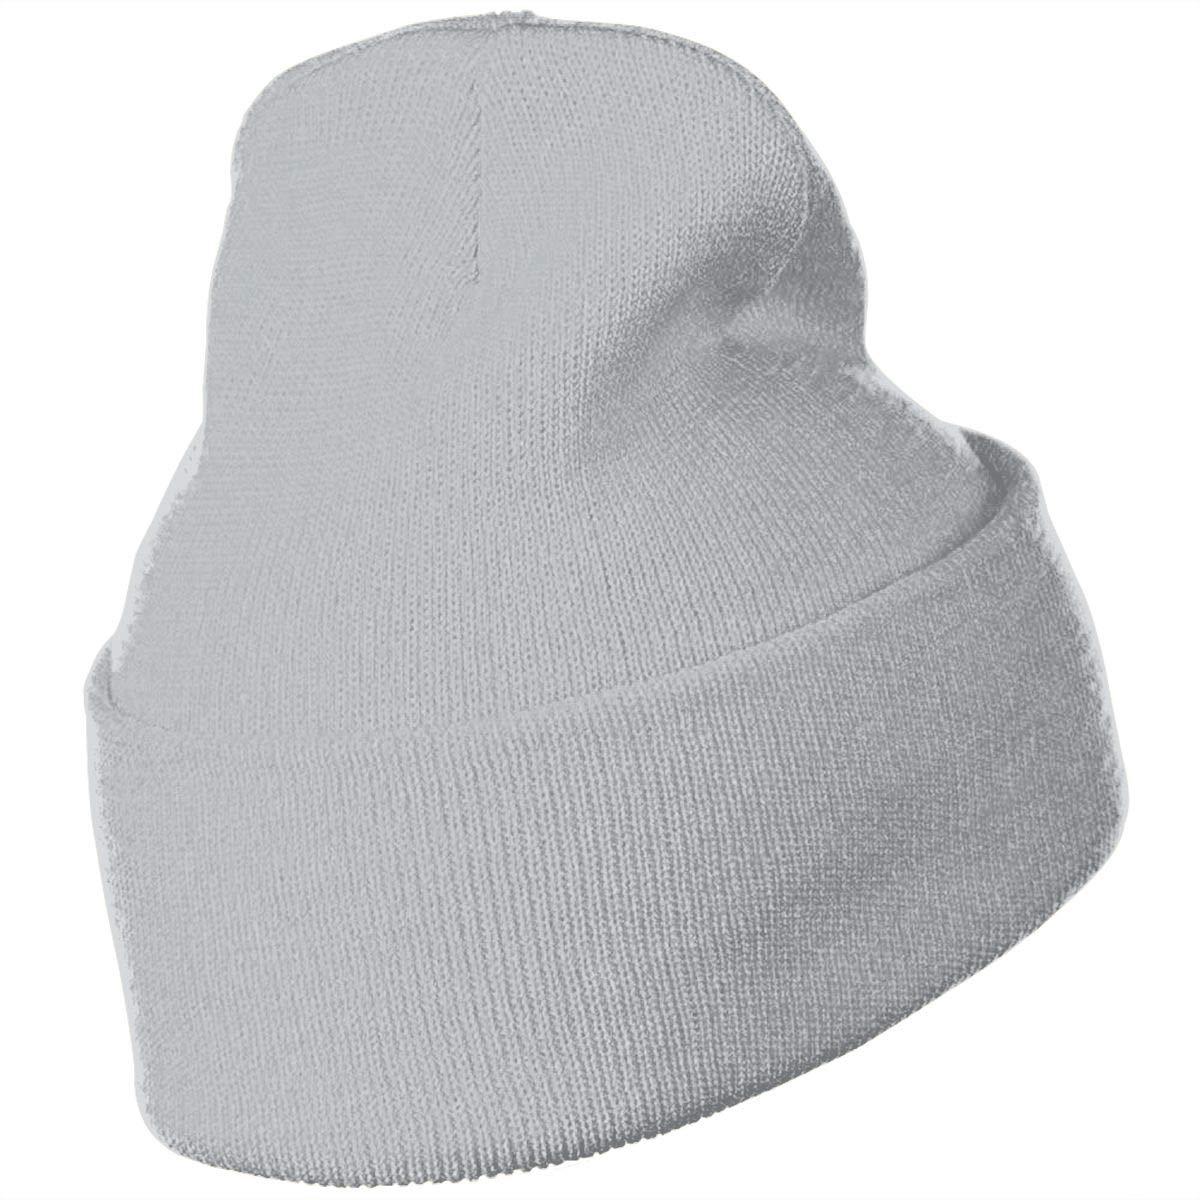 QZqDQ Venezuela Flag Tear Unisex Fashion Knitted Hat Luxury Hip-Hop Cap